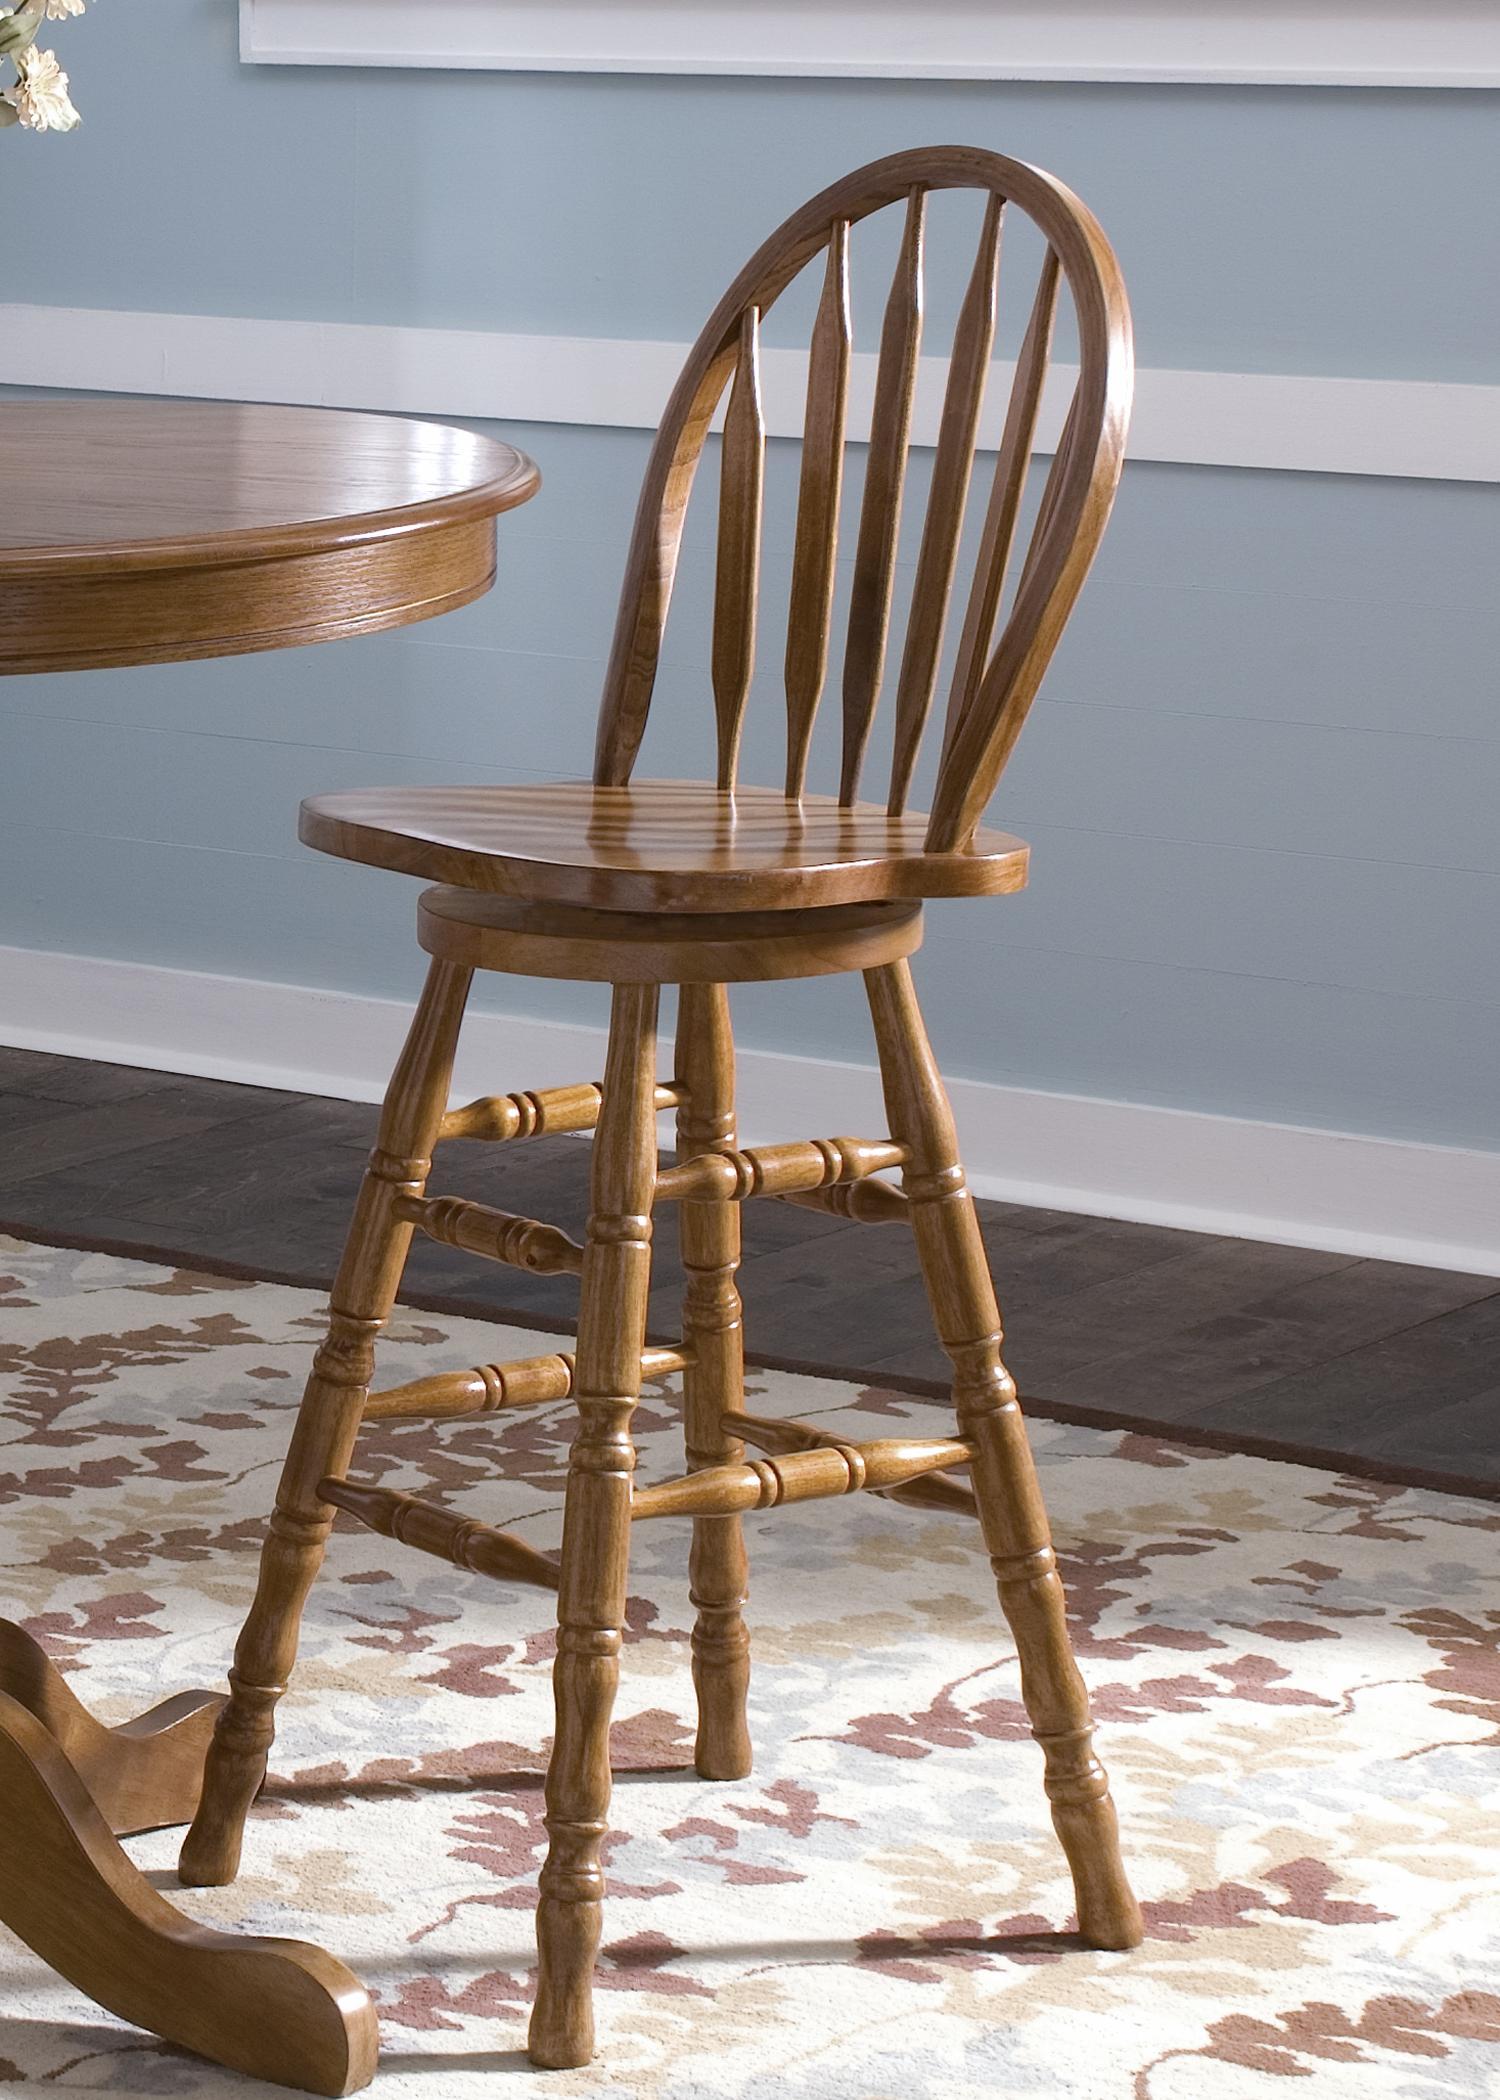 Nostalgia  30 Inch Barstool by Liberty Furniture at Lapeer Furniture & Mattress Center